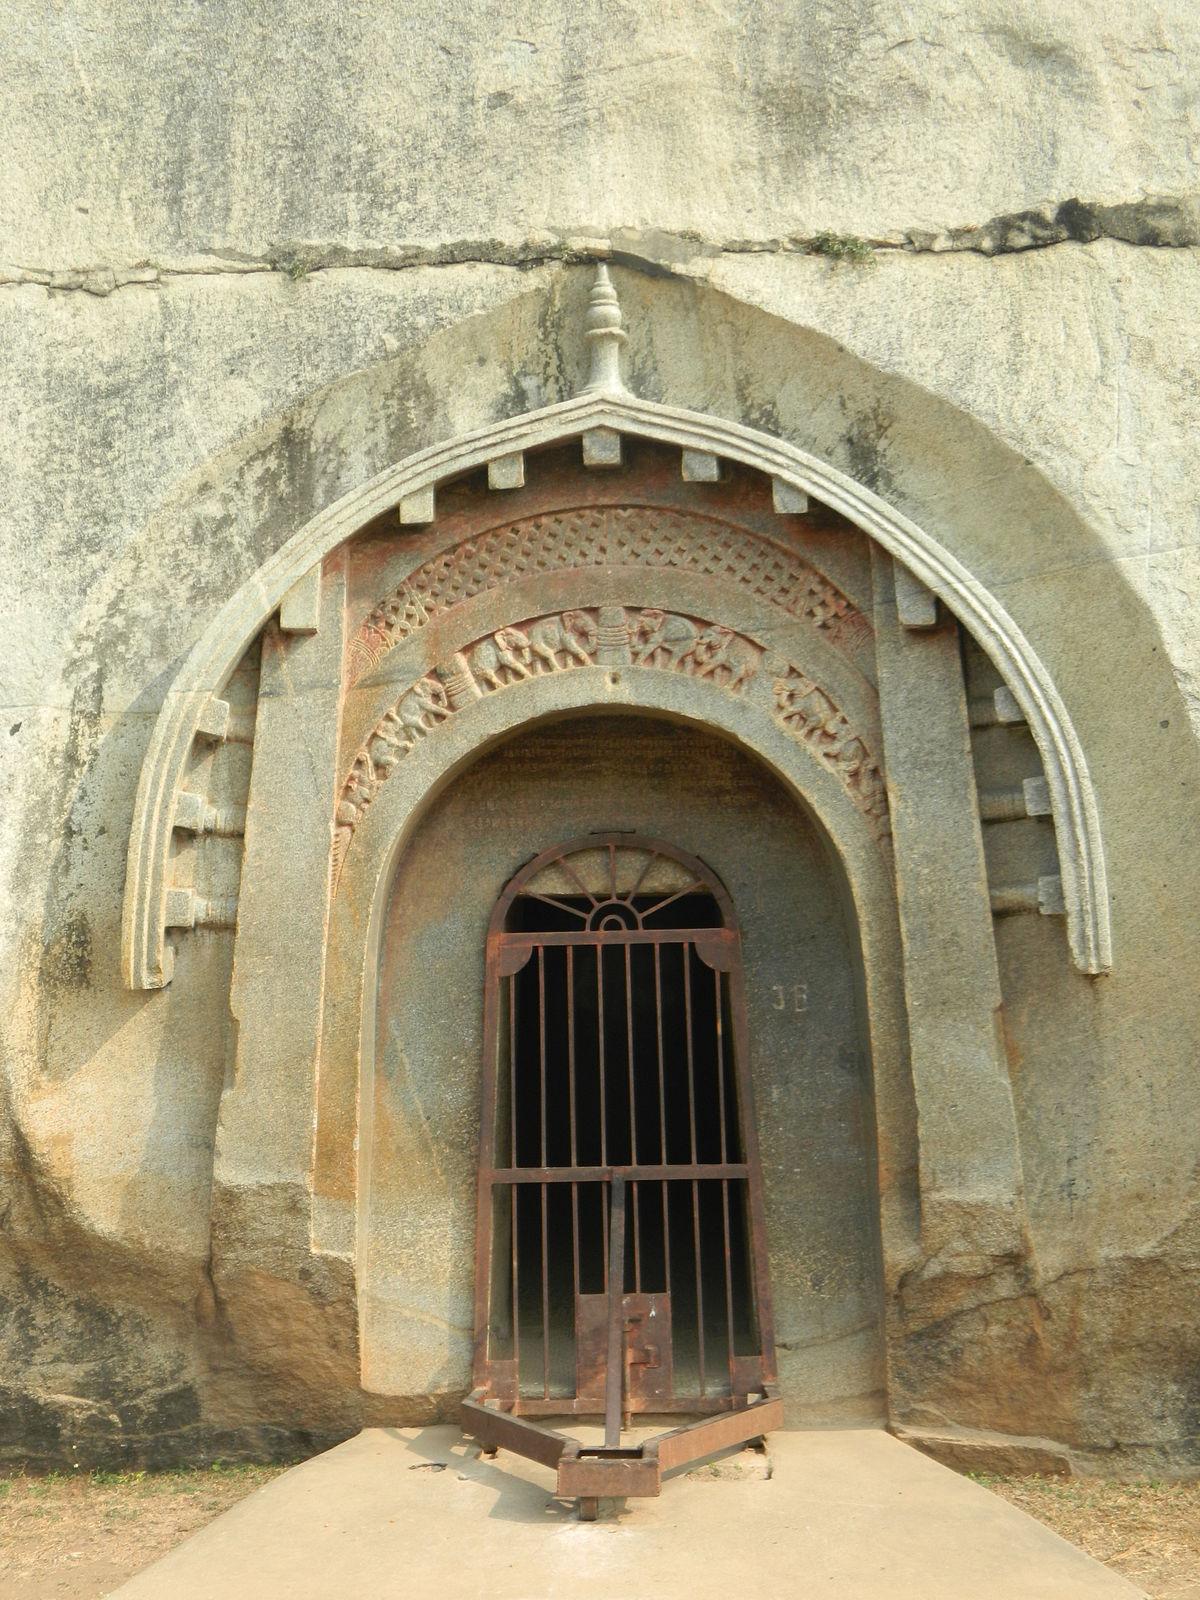 Lomas Rishi Cave  Wikipedia